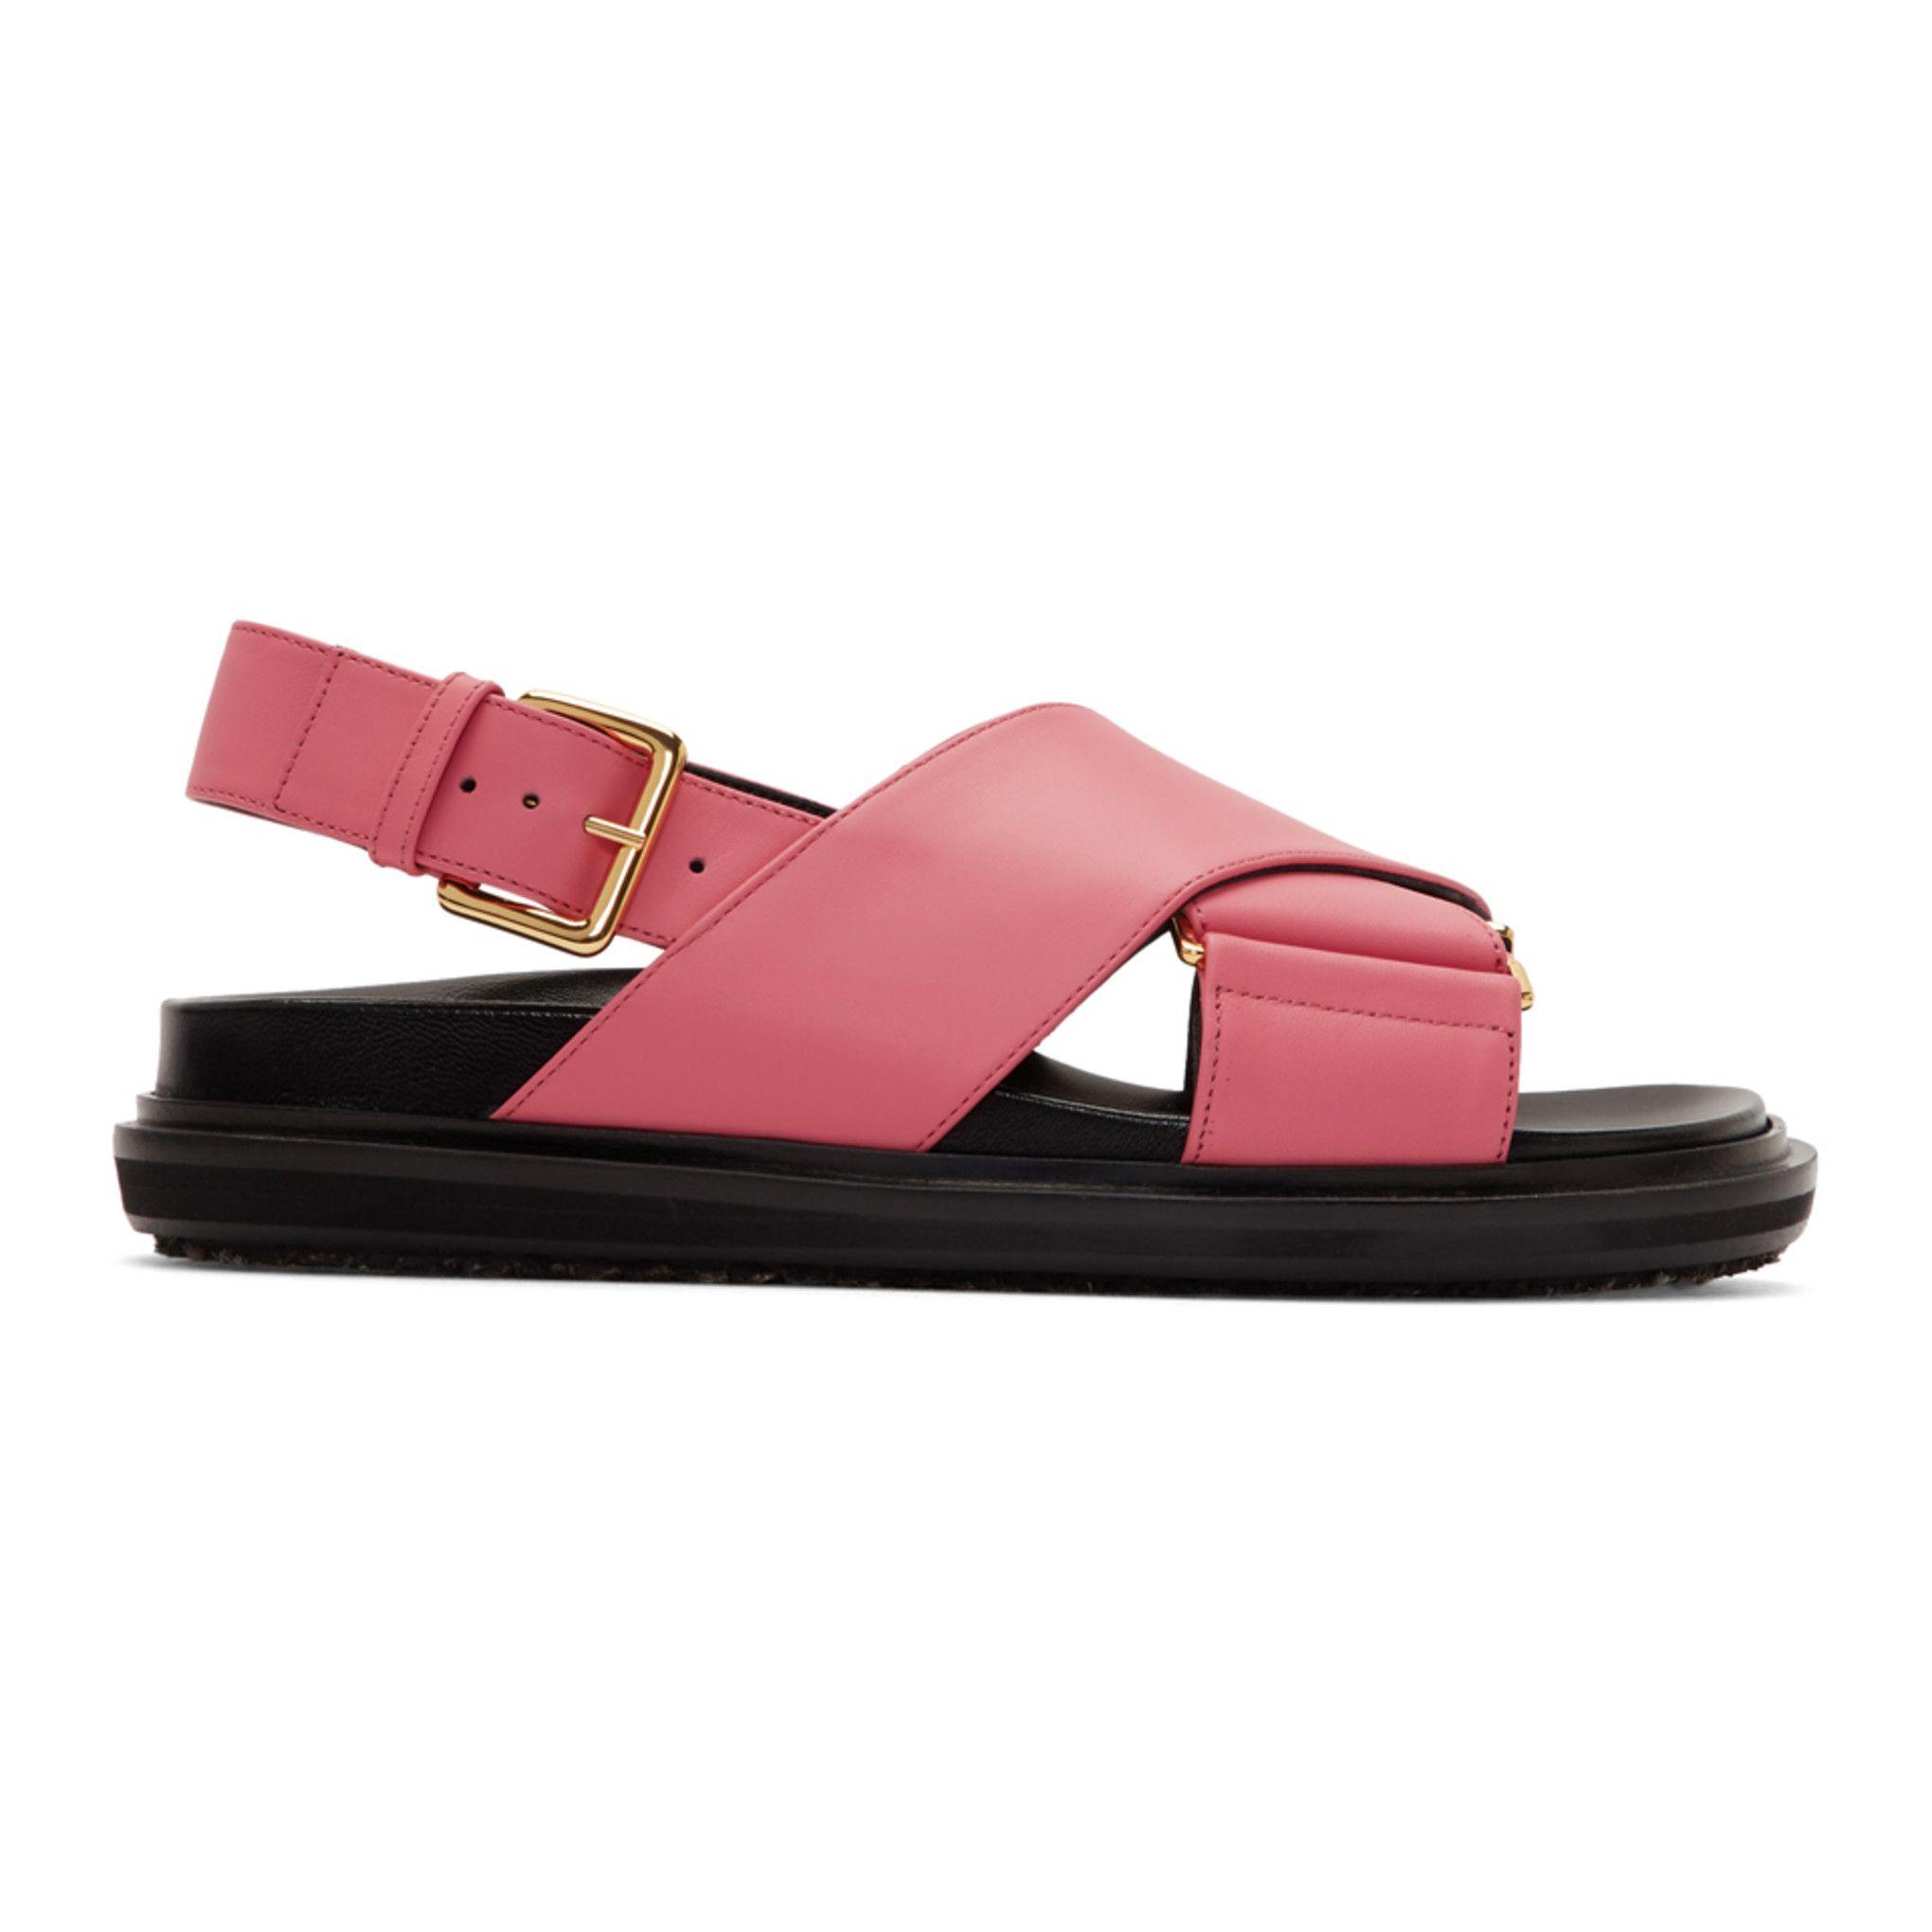 Marni Pink Black Fussbett Sandals Ssense White Leather Sandals Slingback Sandal Christian Louboutin Sandals